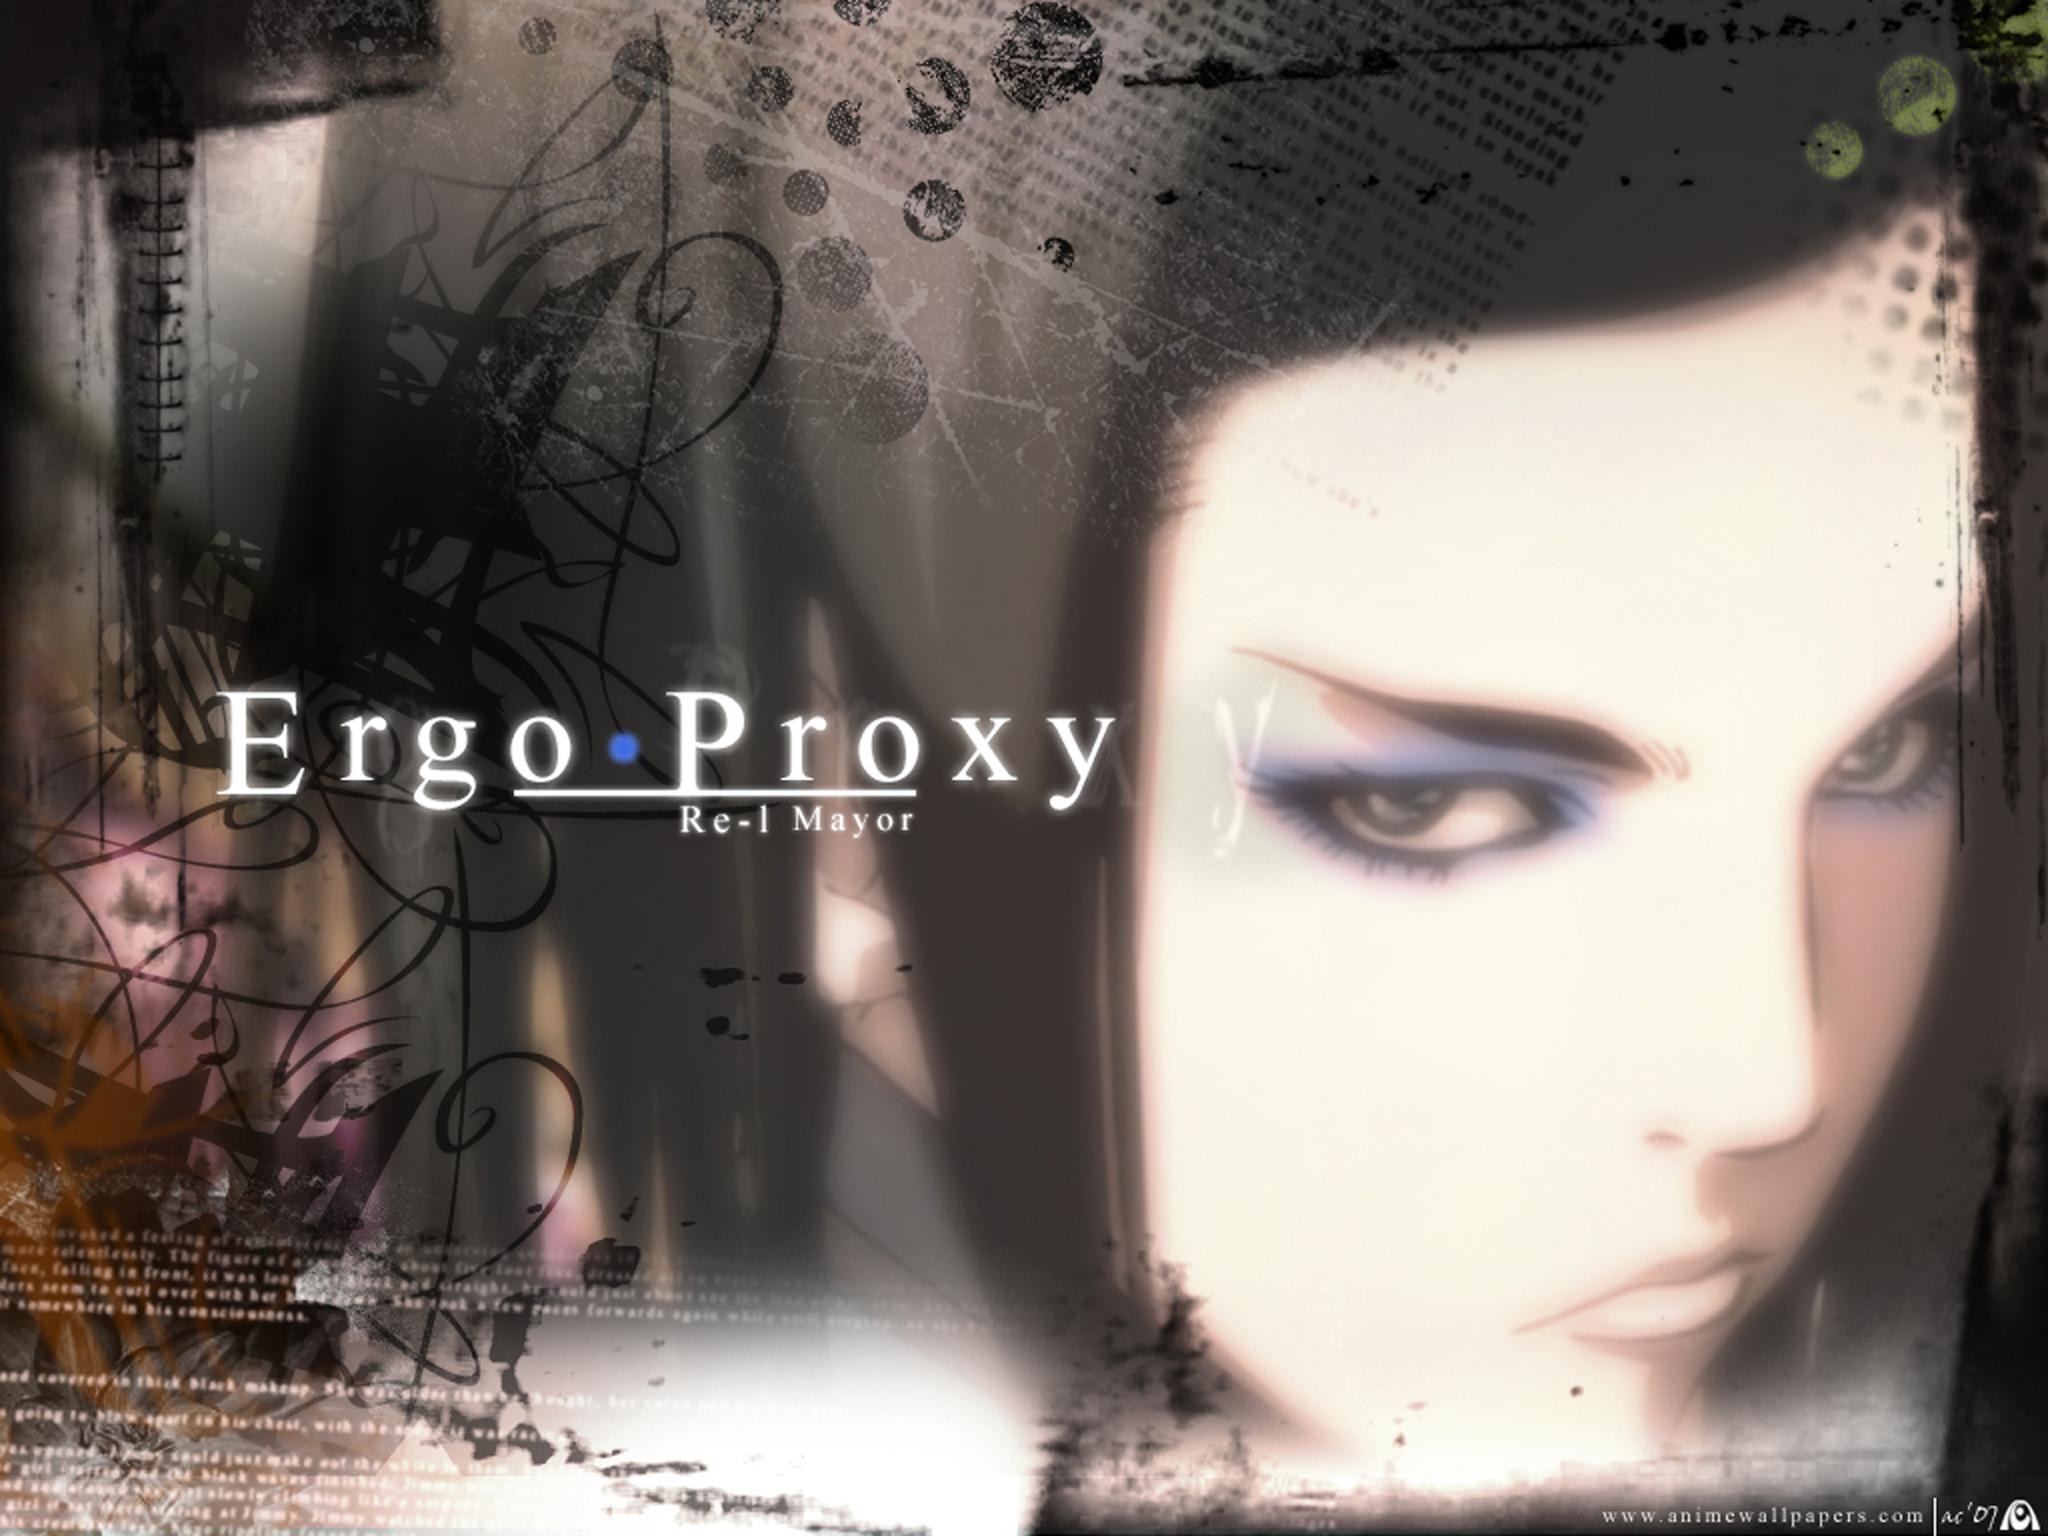 ergo proxy full hd wallpaper